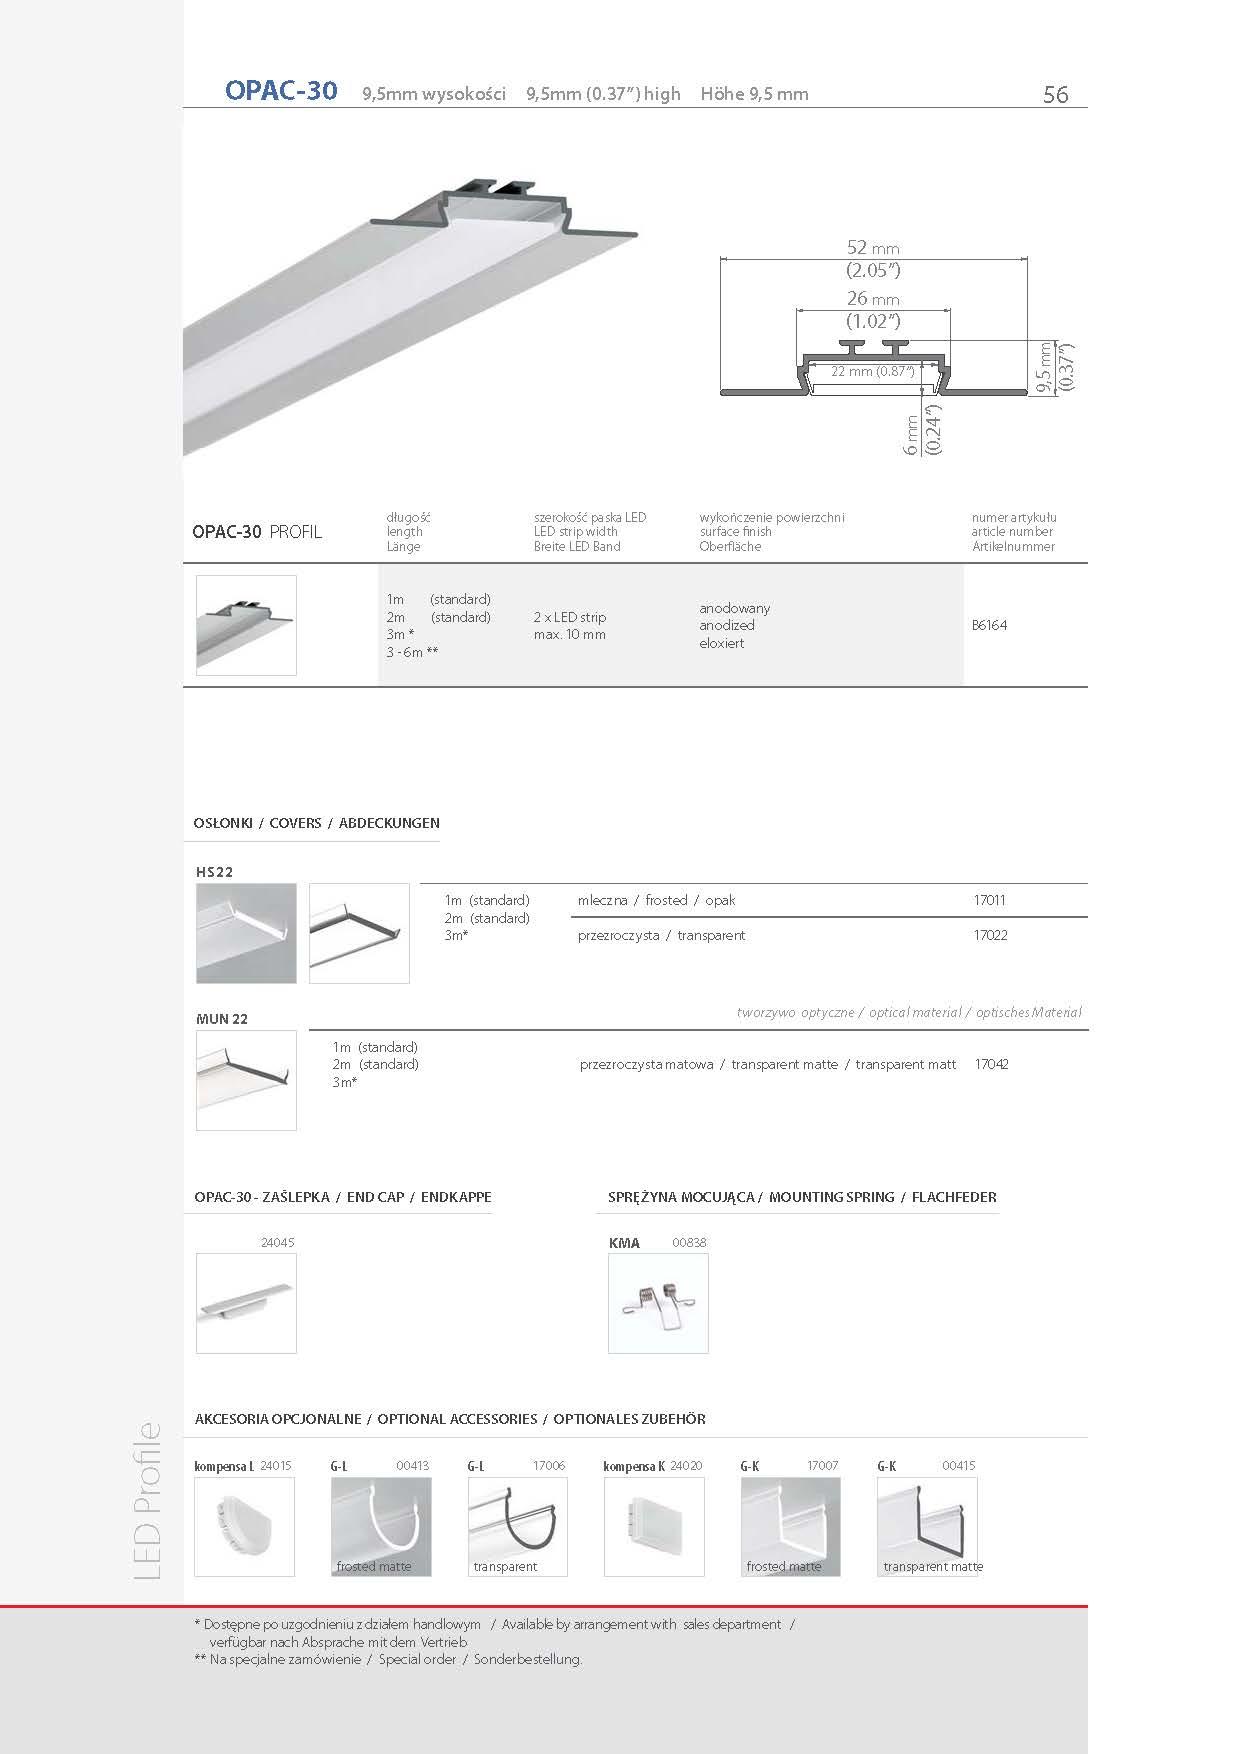 Profiel led opac 30 stair lighting opac 30 profile stair lighting b6164 profile opac stopboris Gallery